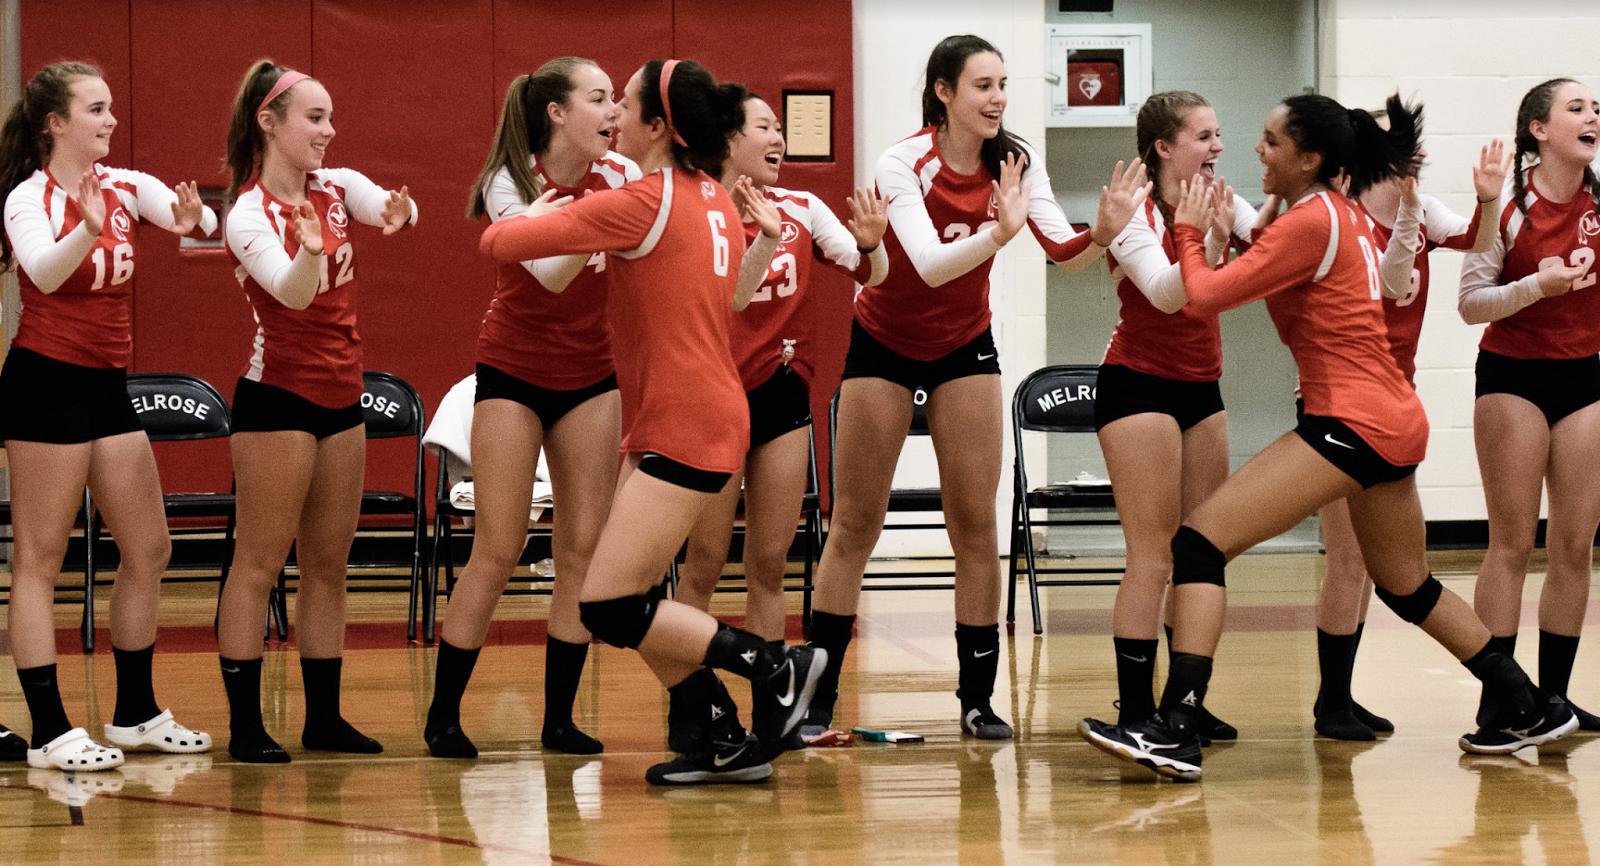 Melrose Lady Raiders Volleyball: Snaps Melrose - NDA